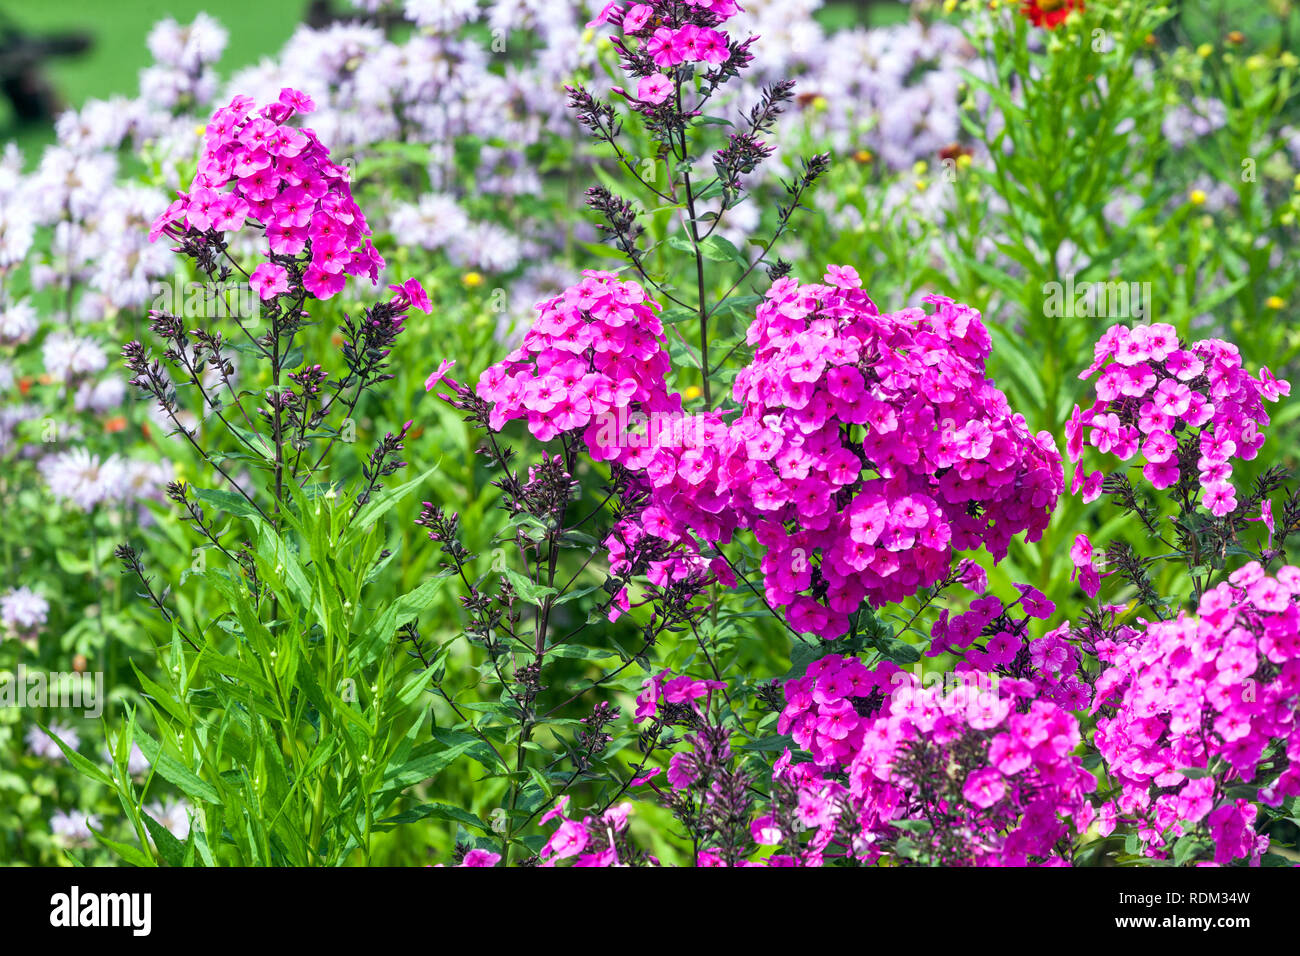 Perennial garden flower border plant Phlox - Stock Image